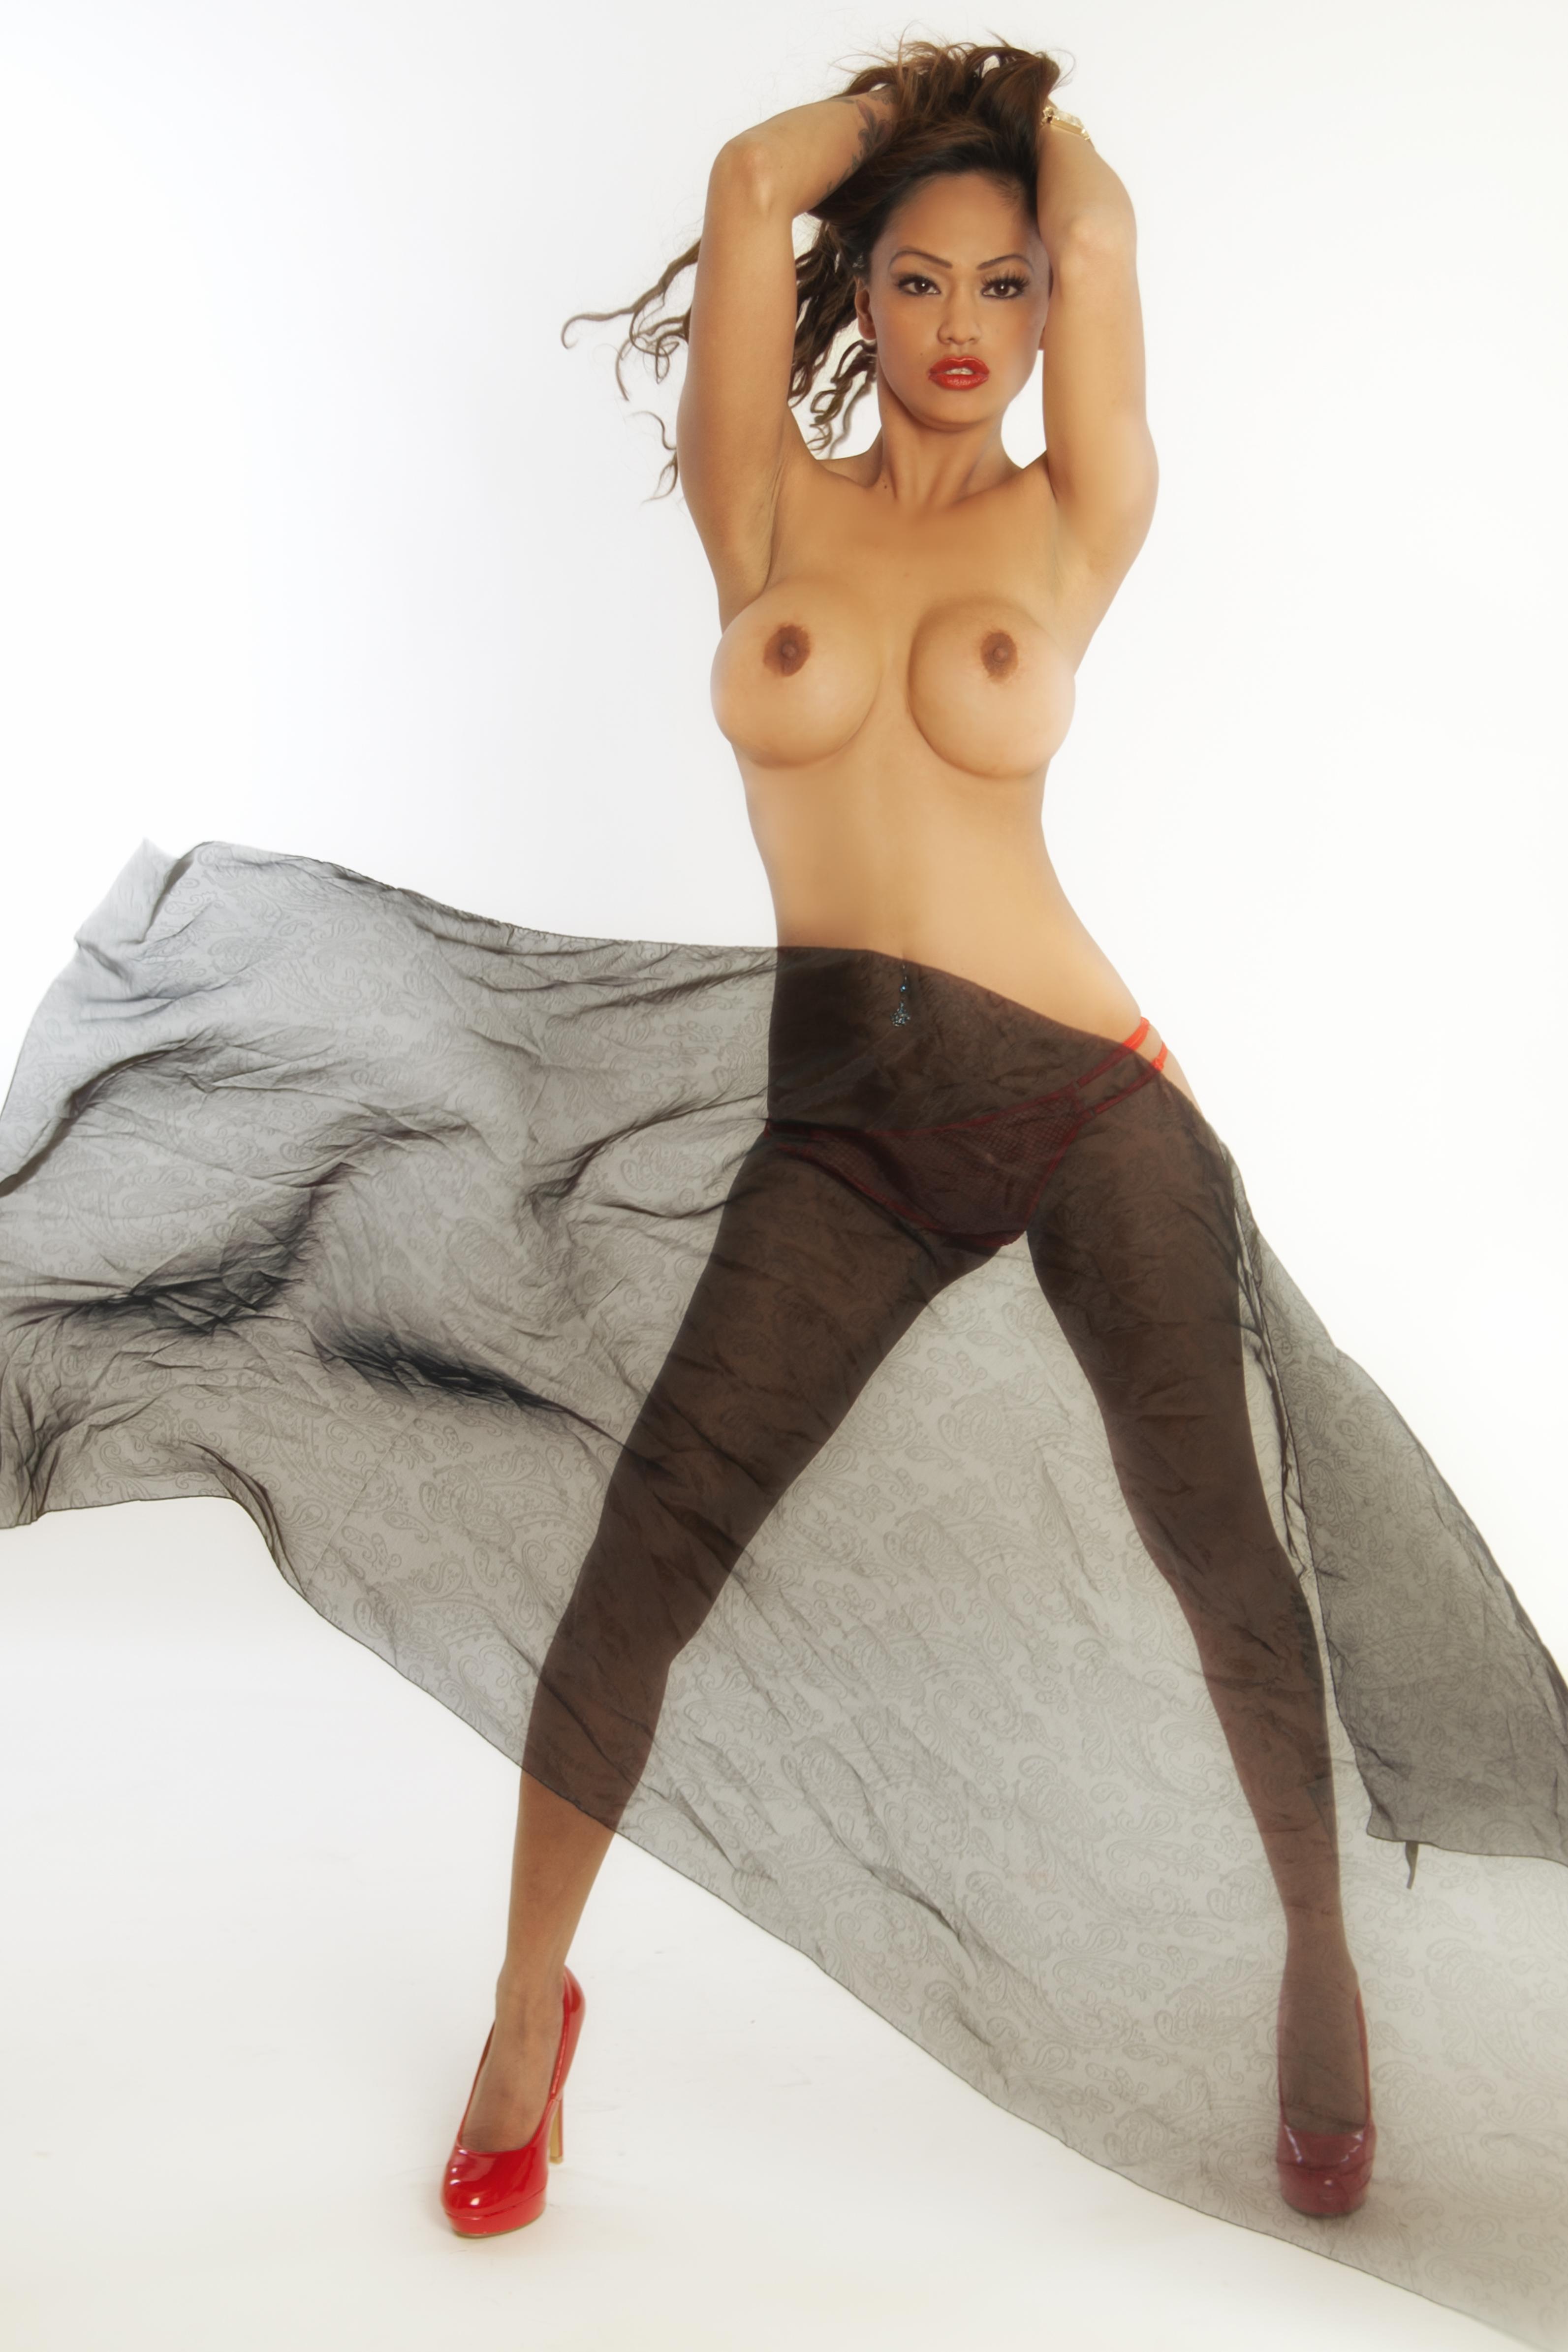 spanischer bock sex modelle bremen